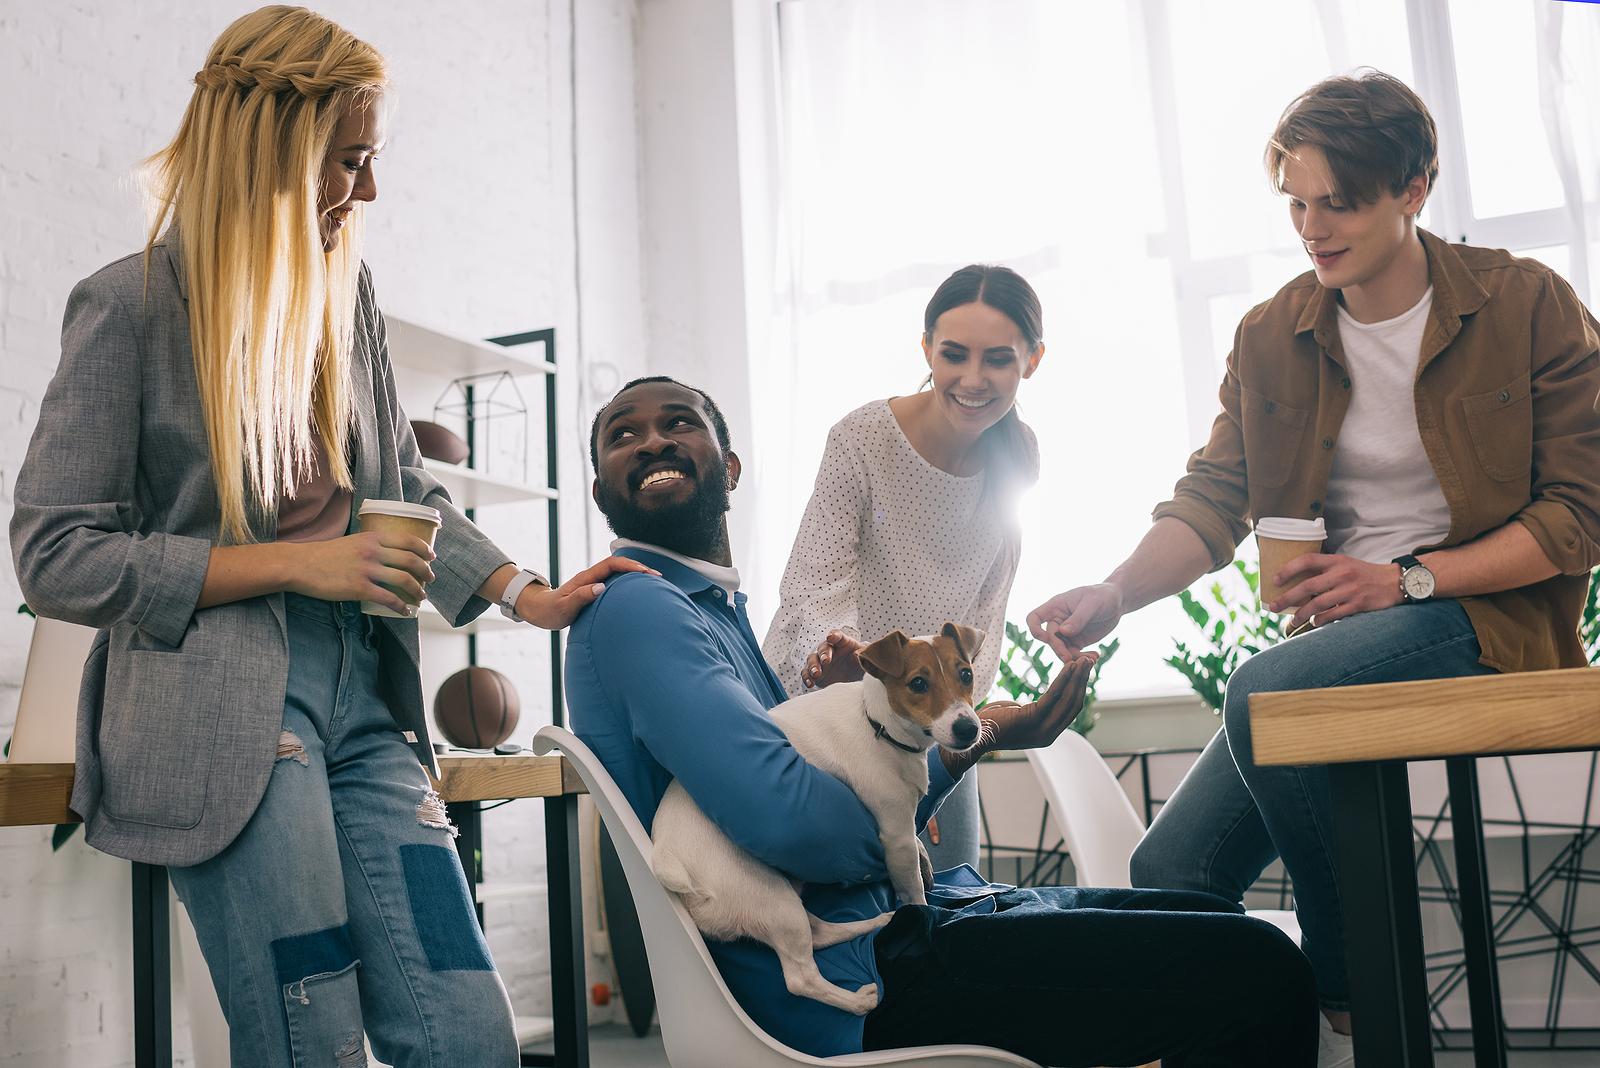 6 Groundbreaking Tips for Branding Your Startup